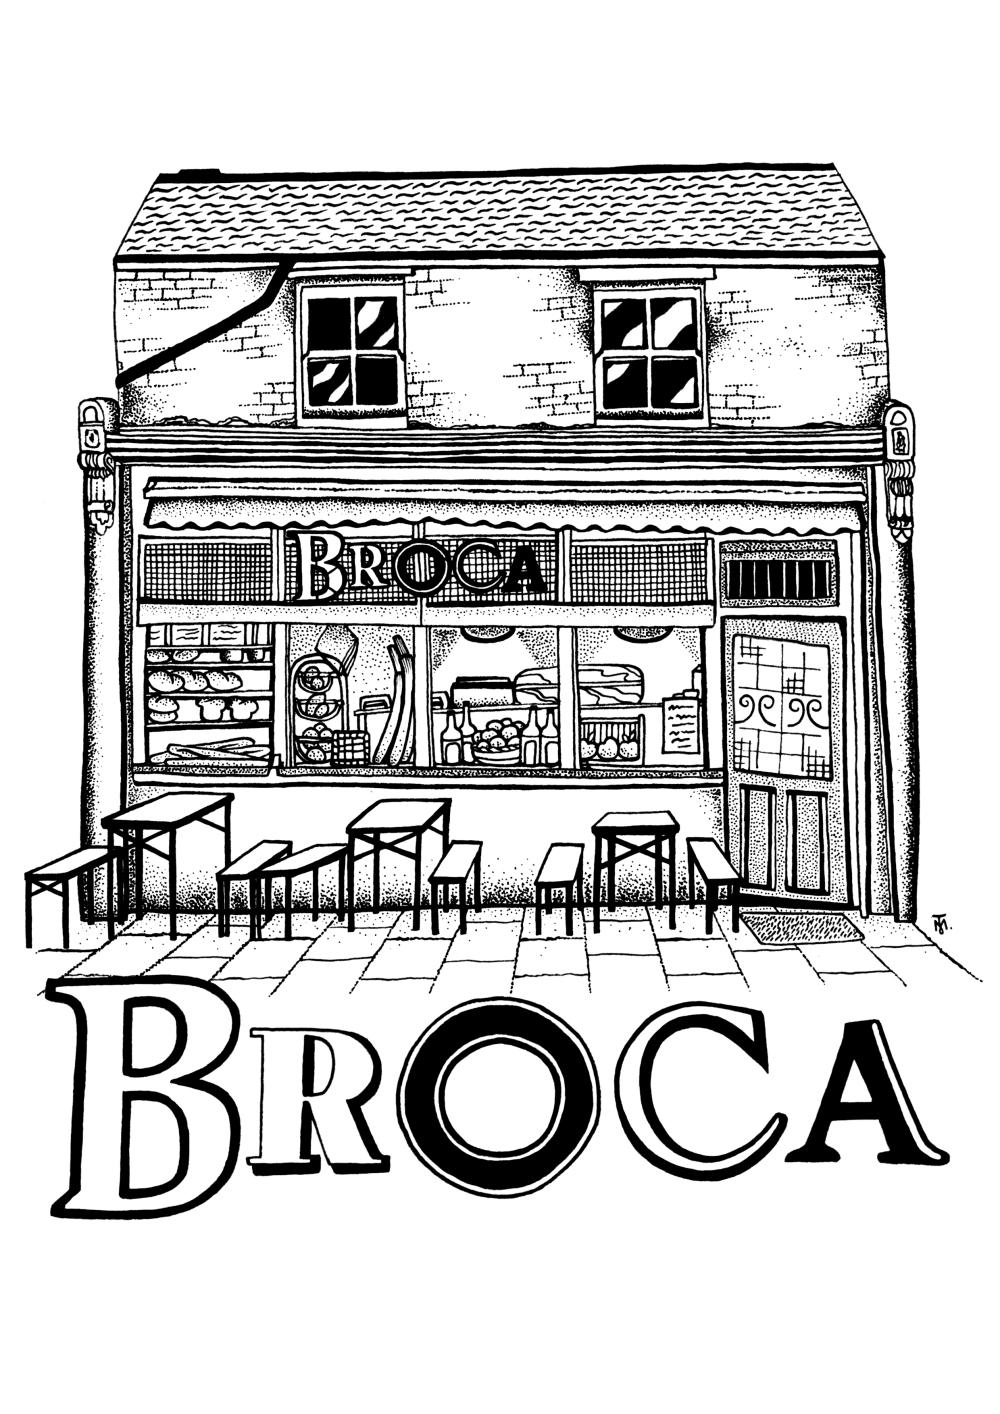 brocalogoandbuilding